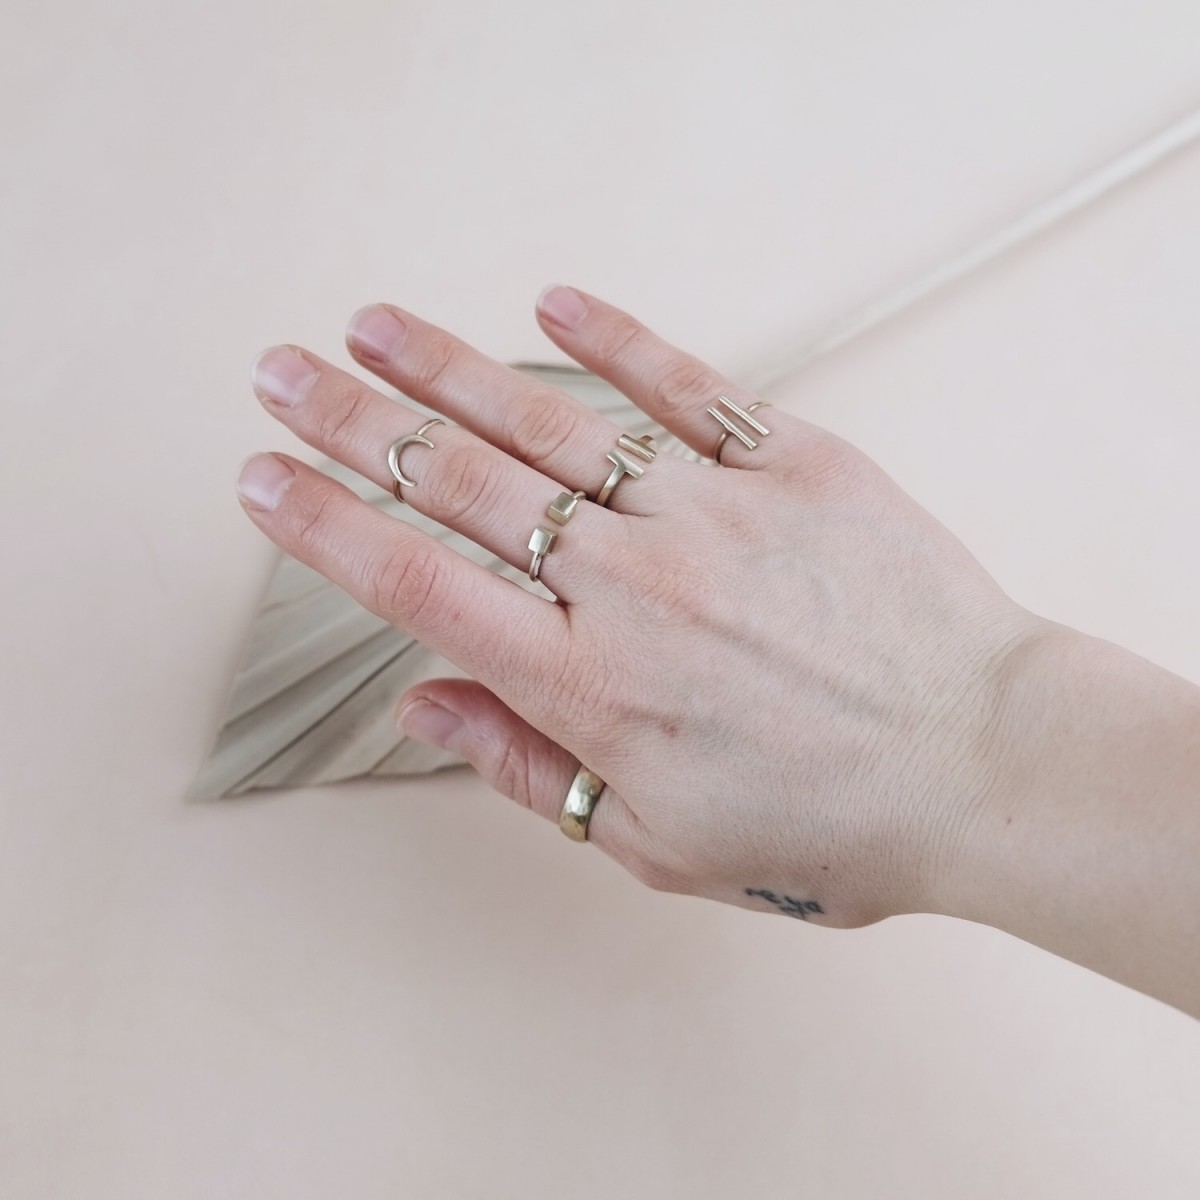 BRASSCAKE // Cube Ring